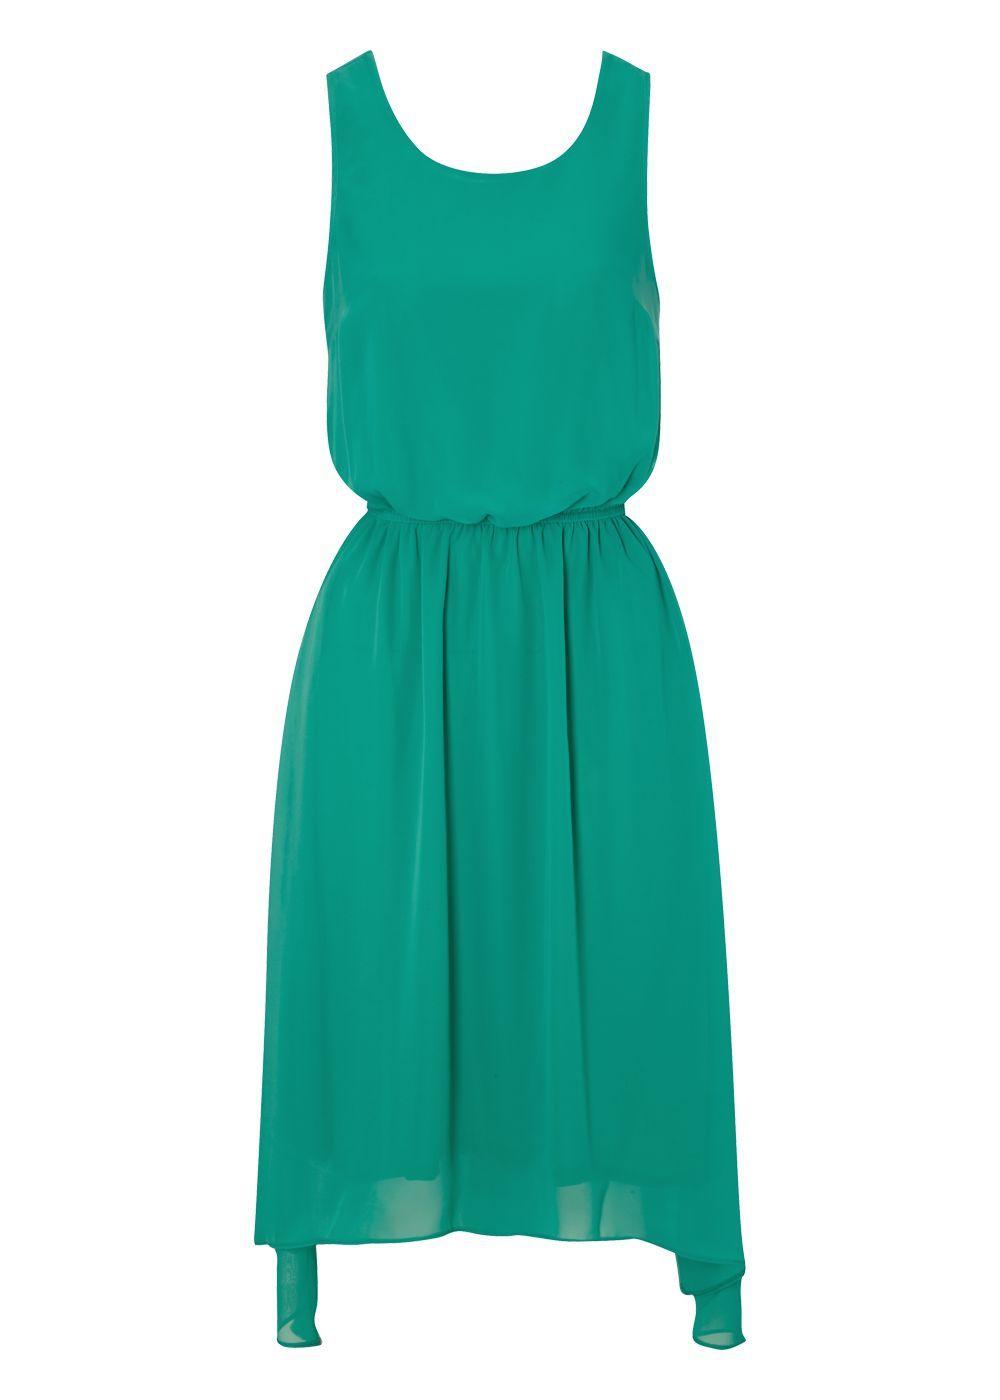 Pleated maxi dress matalan | Maxi dress gallery